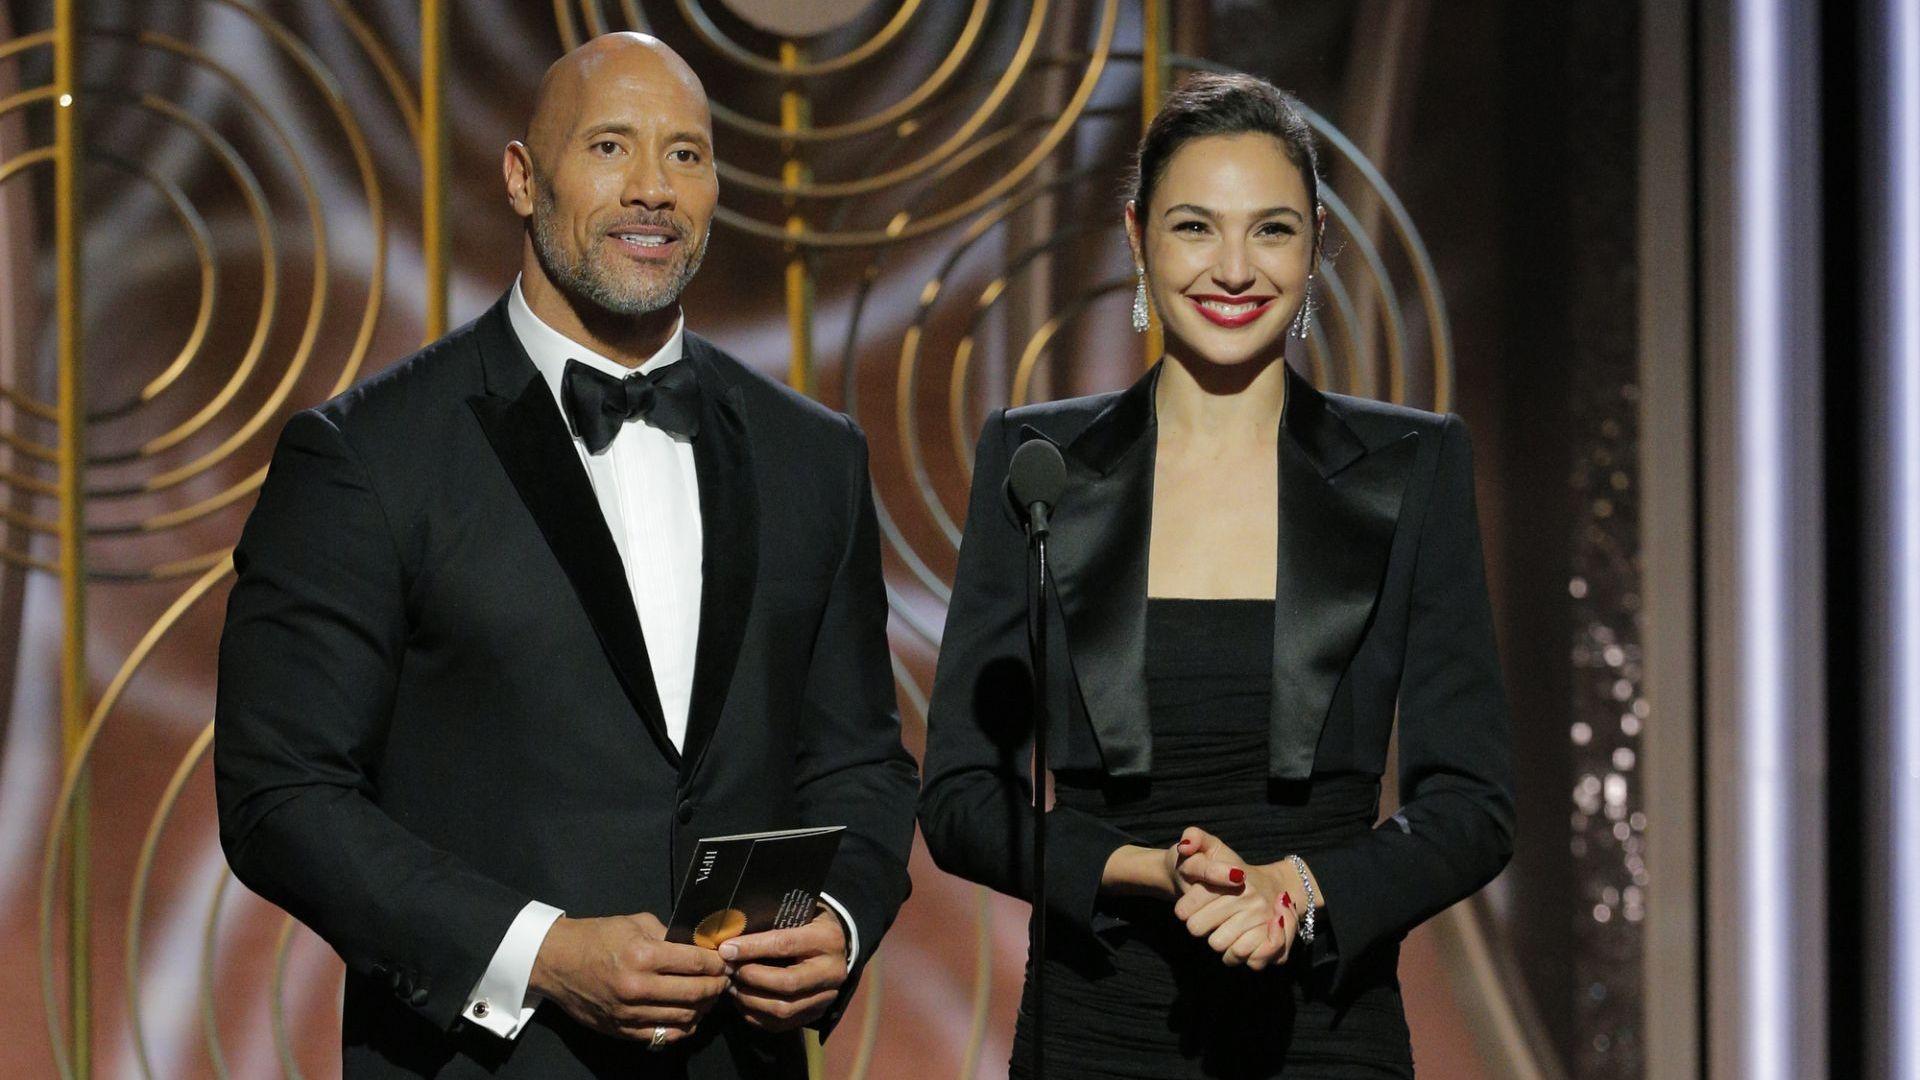 Скалата, Гал Гадот и Леонардо ди Каприо превземат Netflix